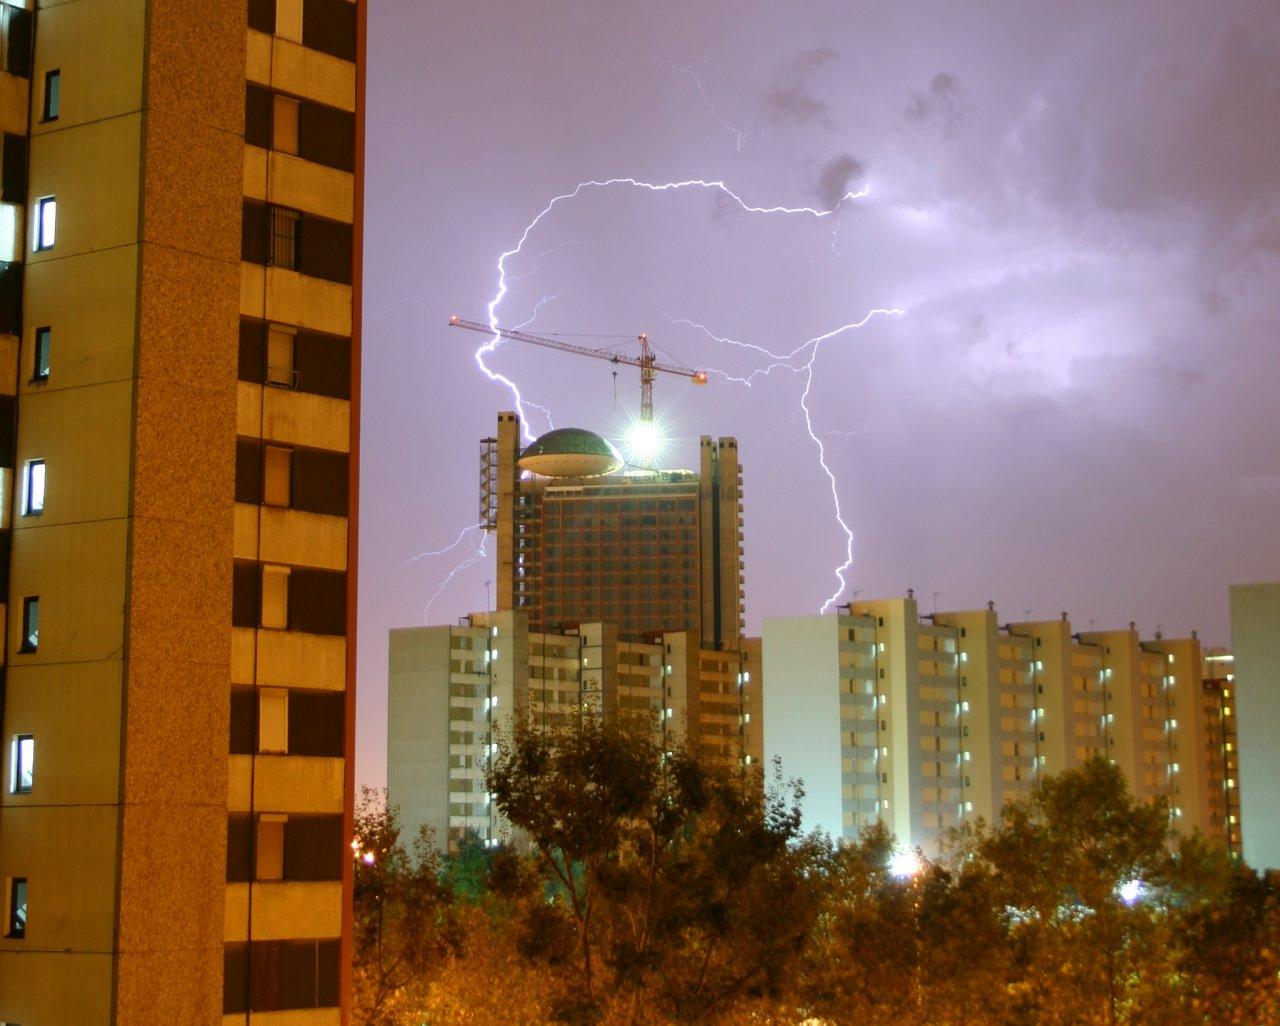 File:Hospitalet.Tormenta.Electrica.jpg - Wikimedia Commons